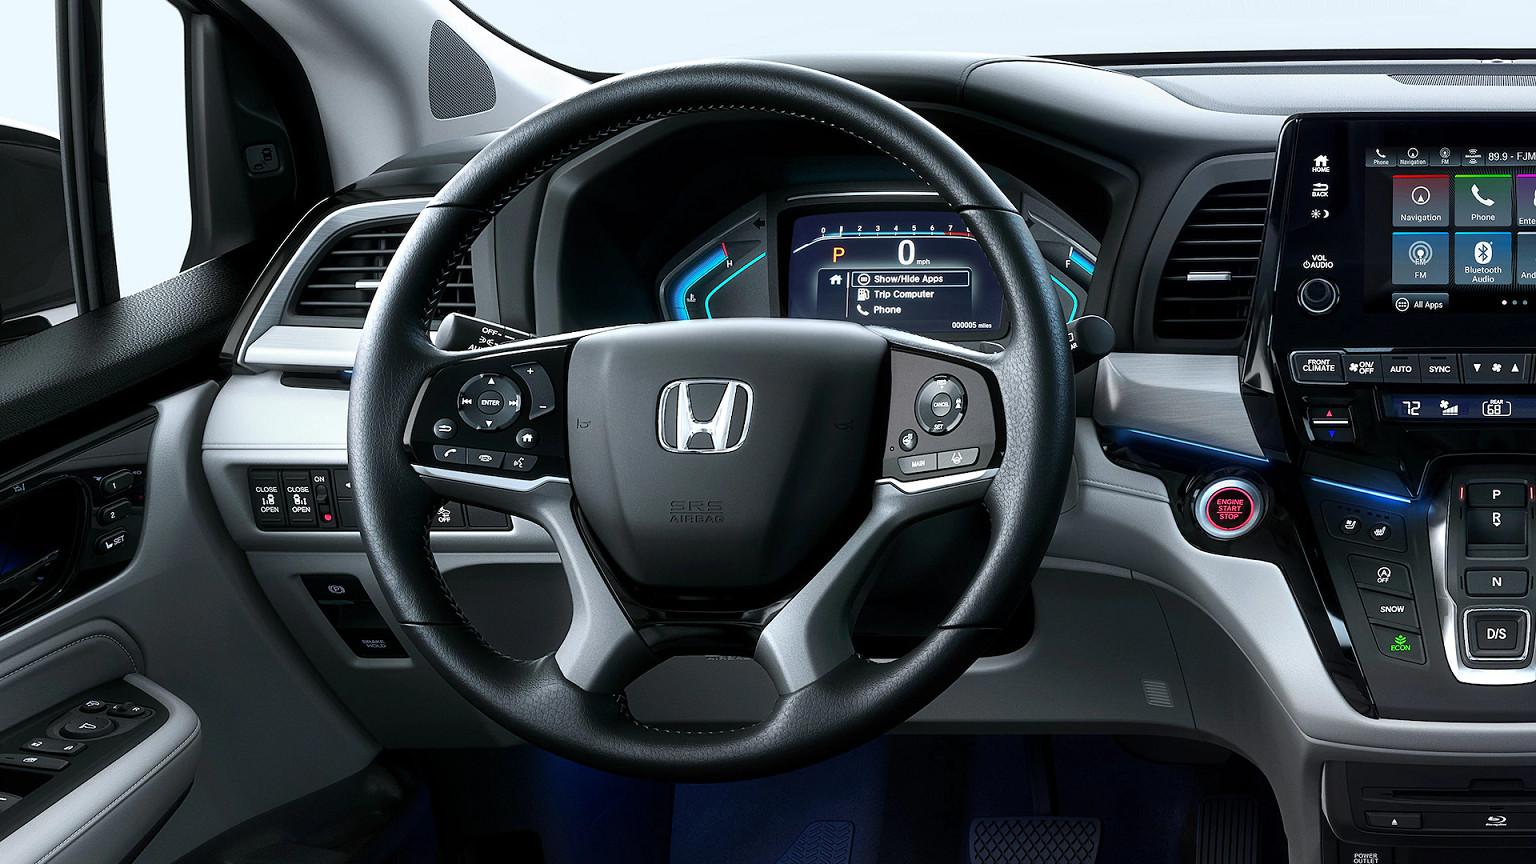 Steering Wheel of the 2020 Odyssey